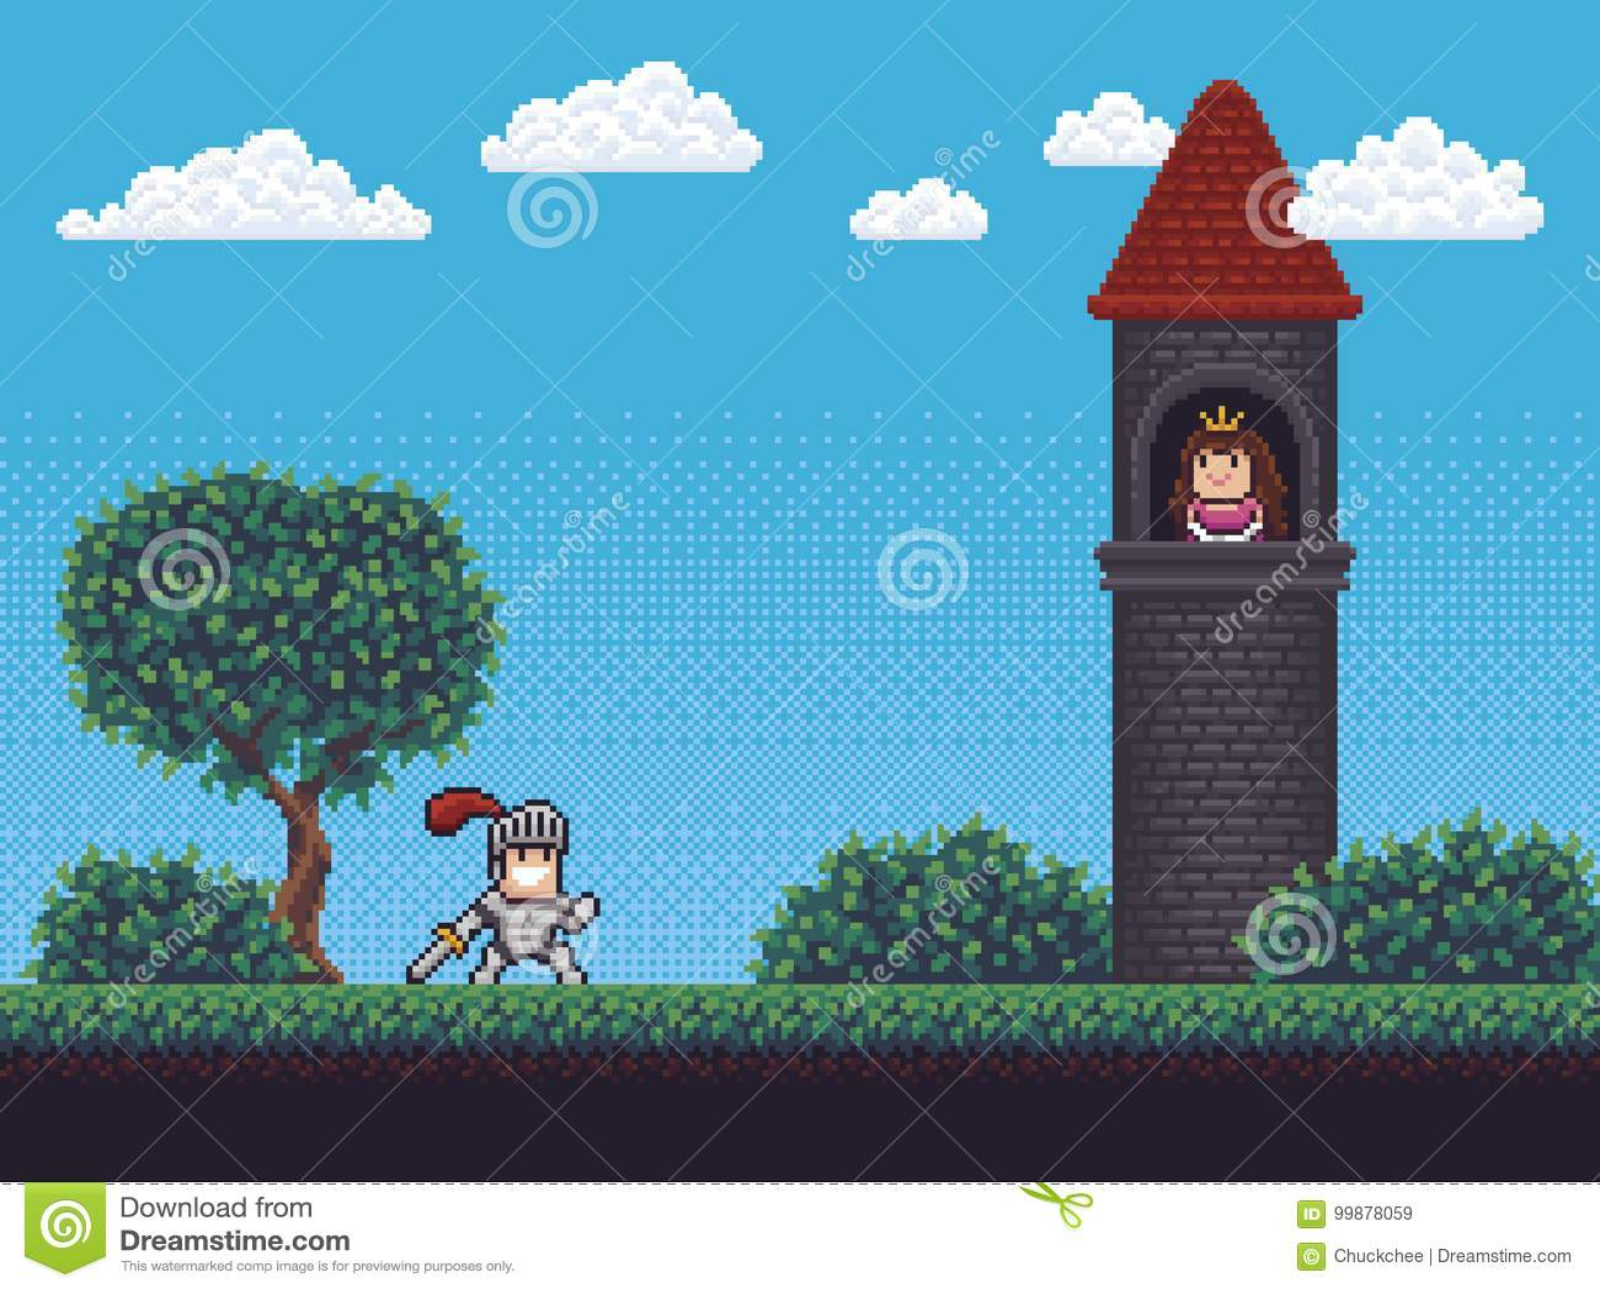 Pixel Art Scene Illustration De Vecteur Illustration Du